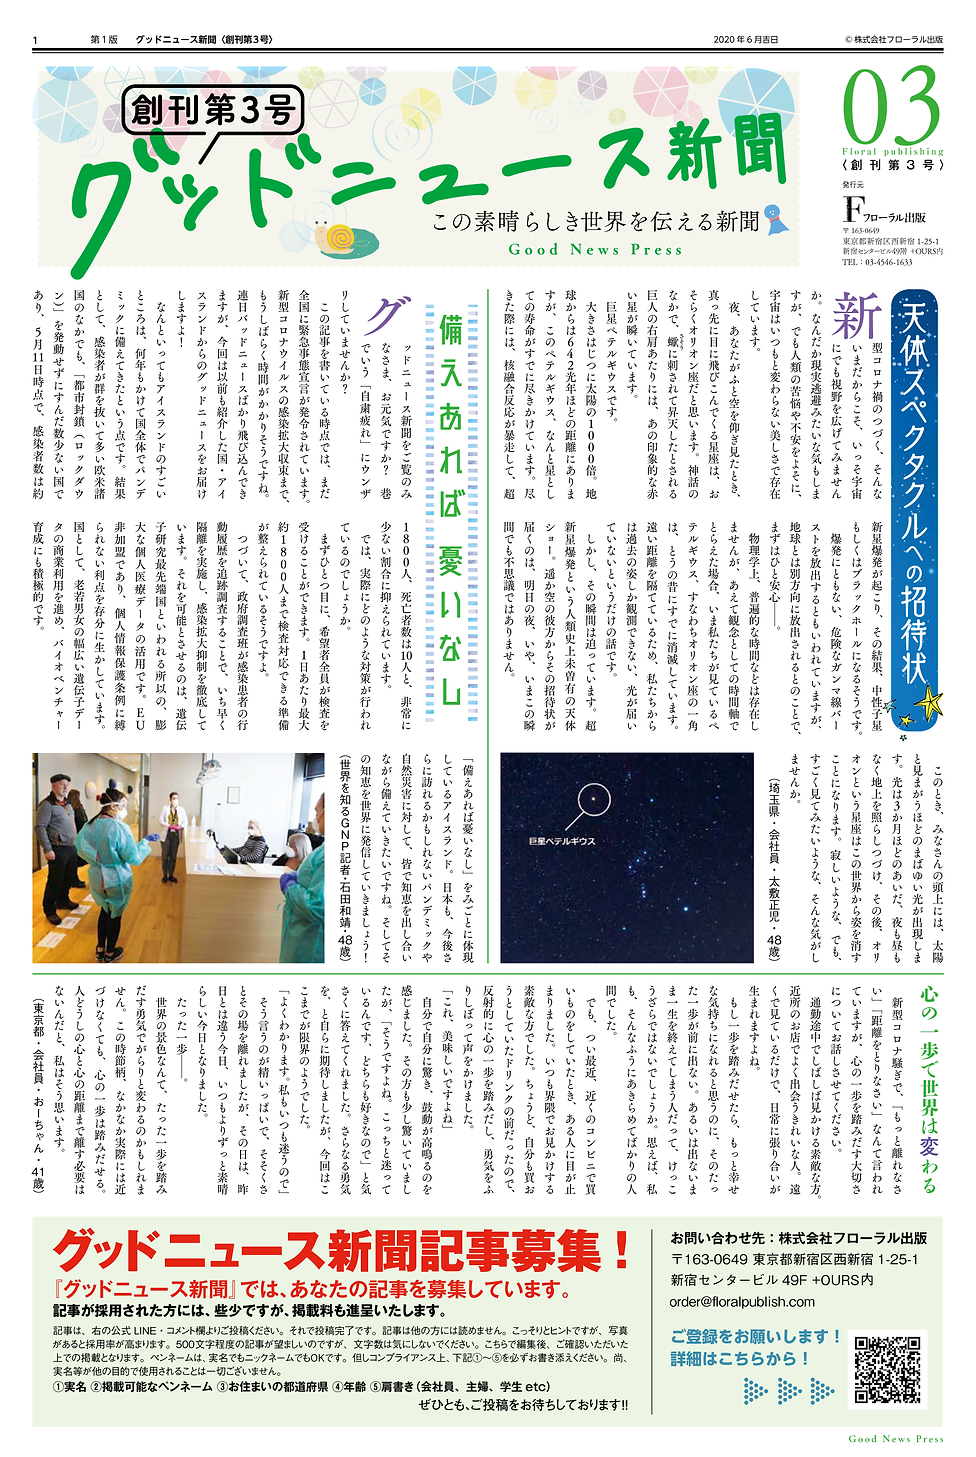 GNP3号 web用_ページ_1.png